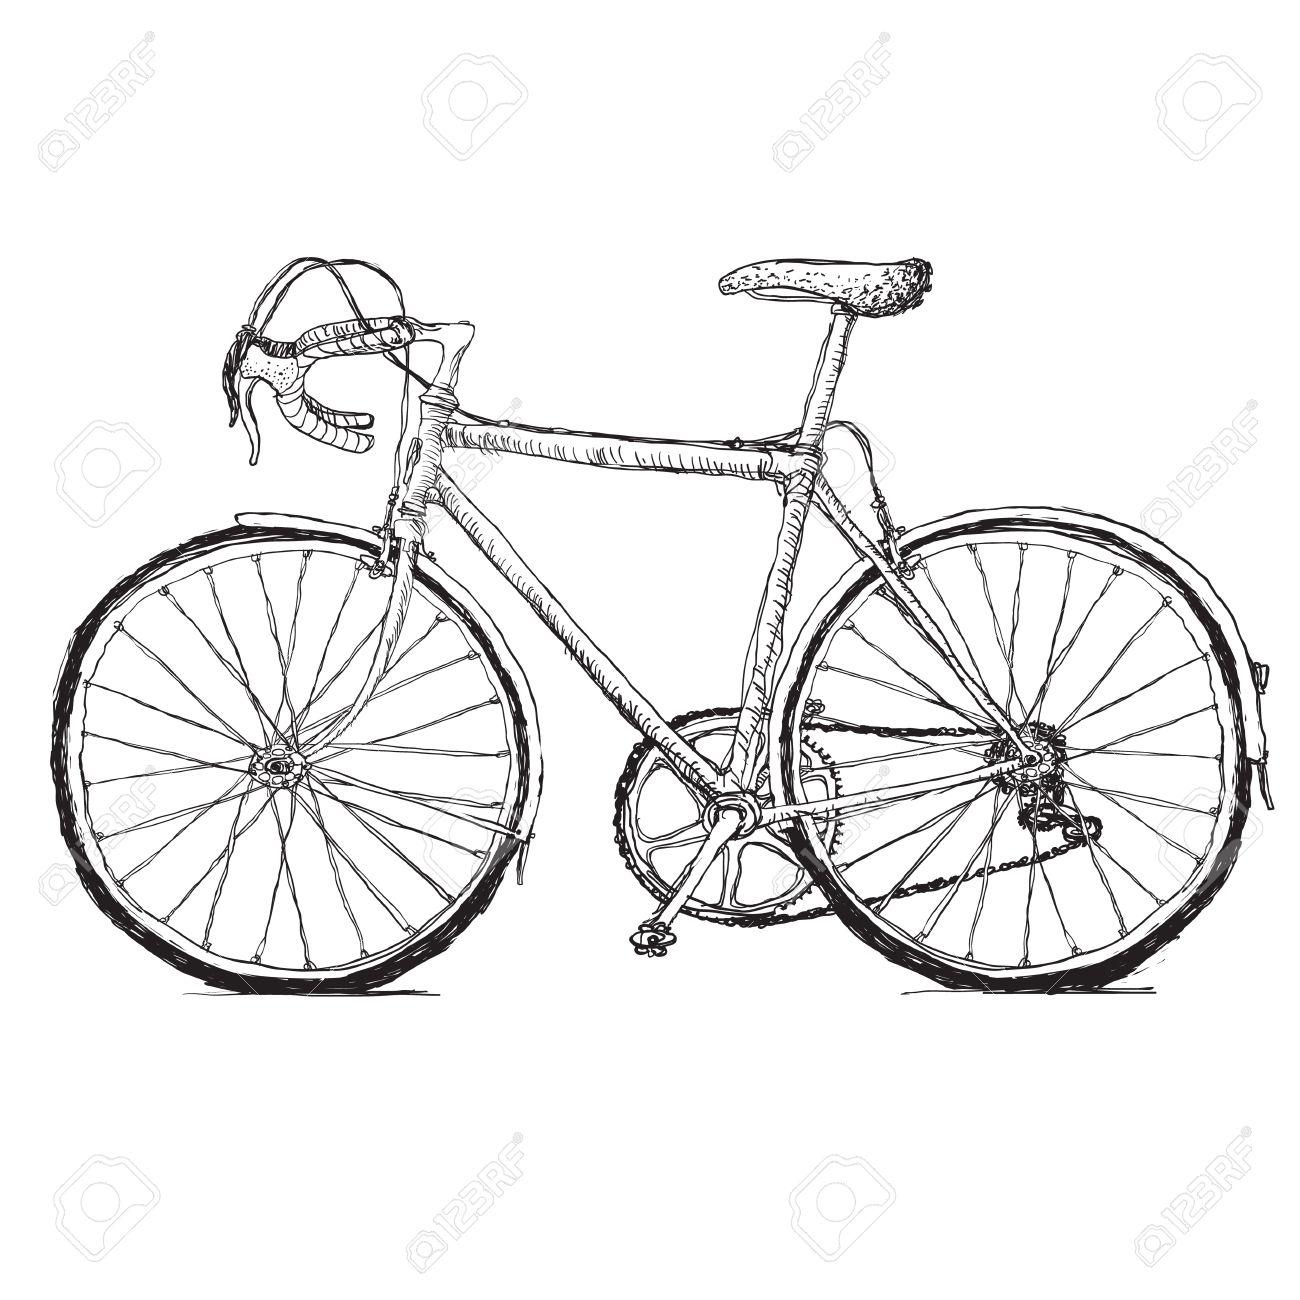 Vintage road bicycle hand drawn illustration - 34143423